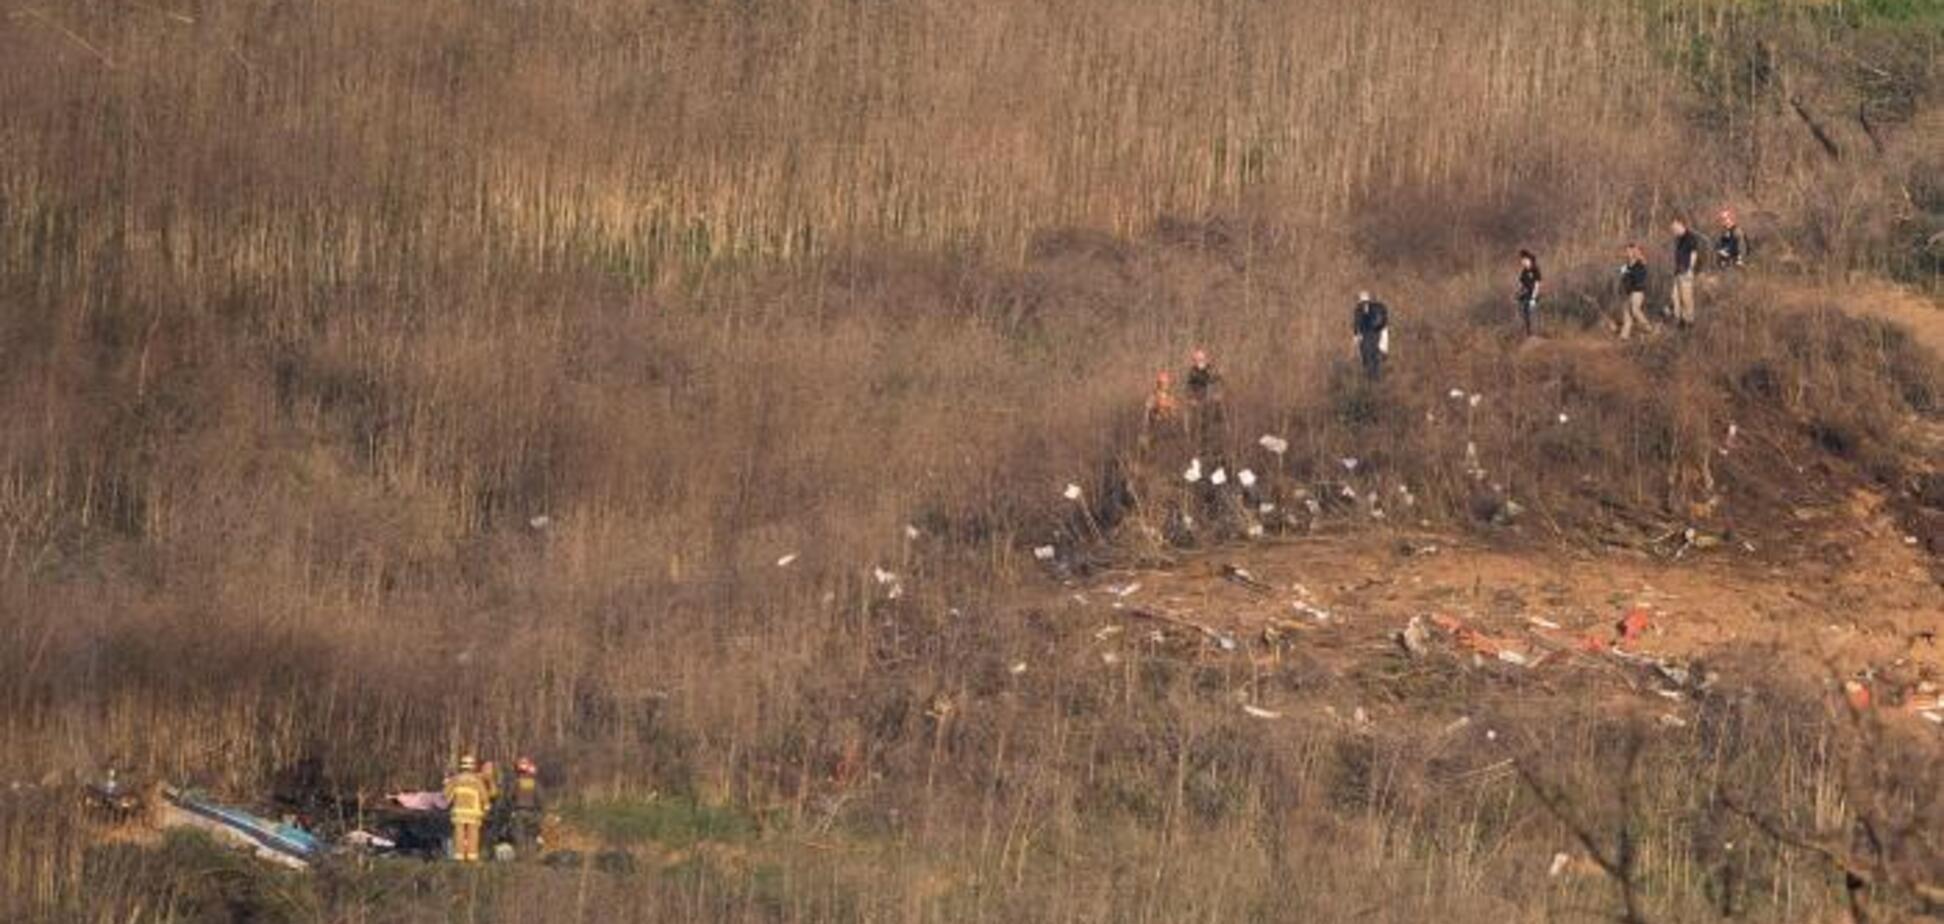 В сети показали момент крушения вертолета Коби Брайанта. Видео